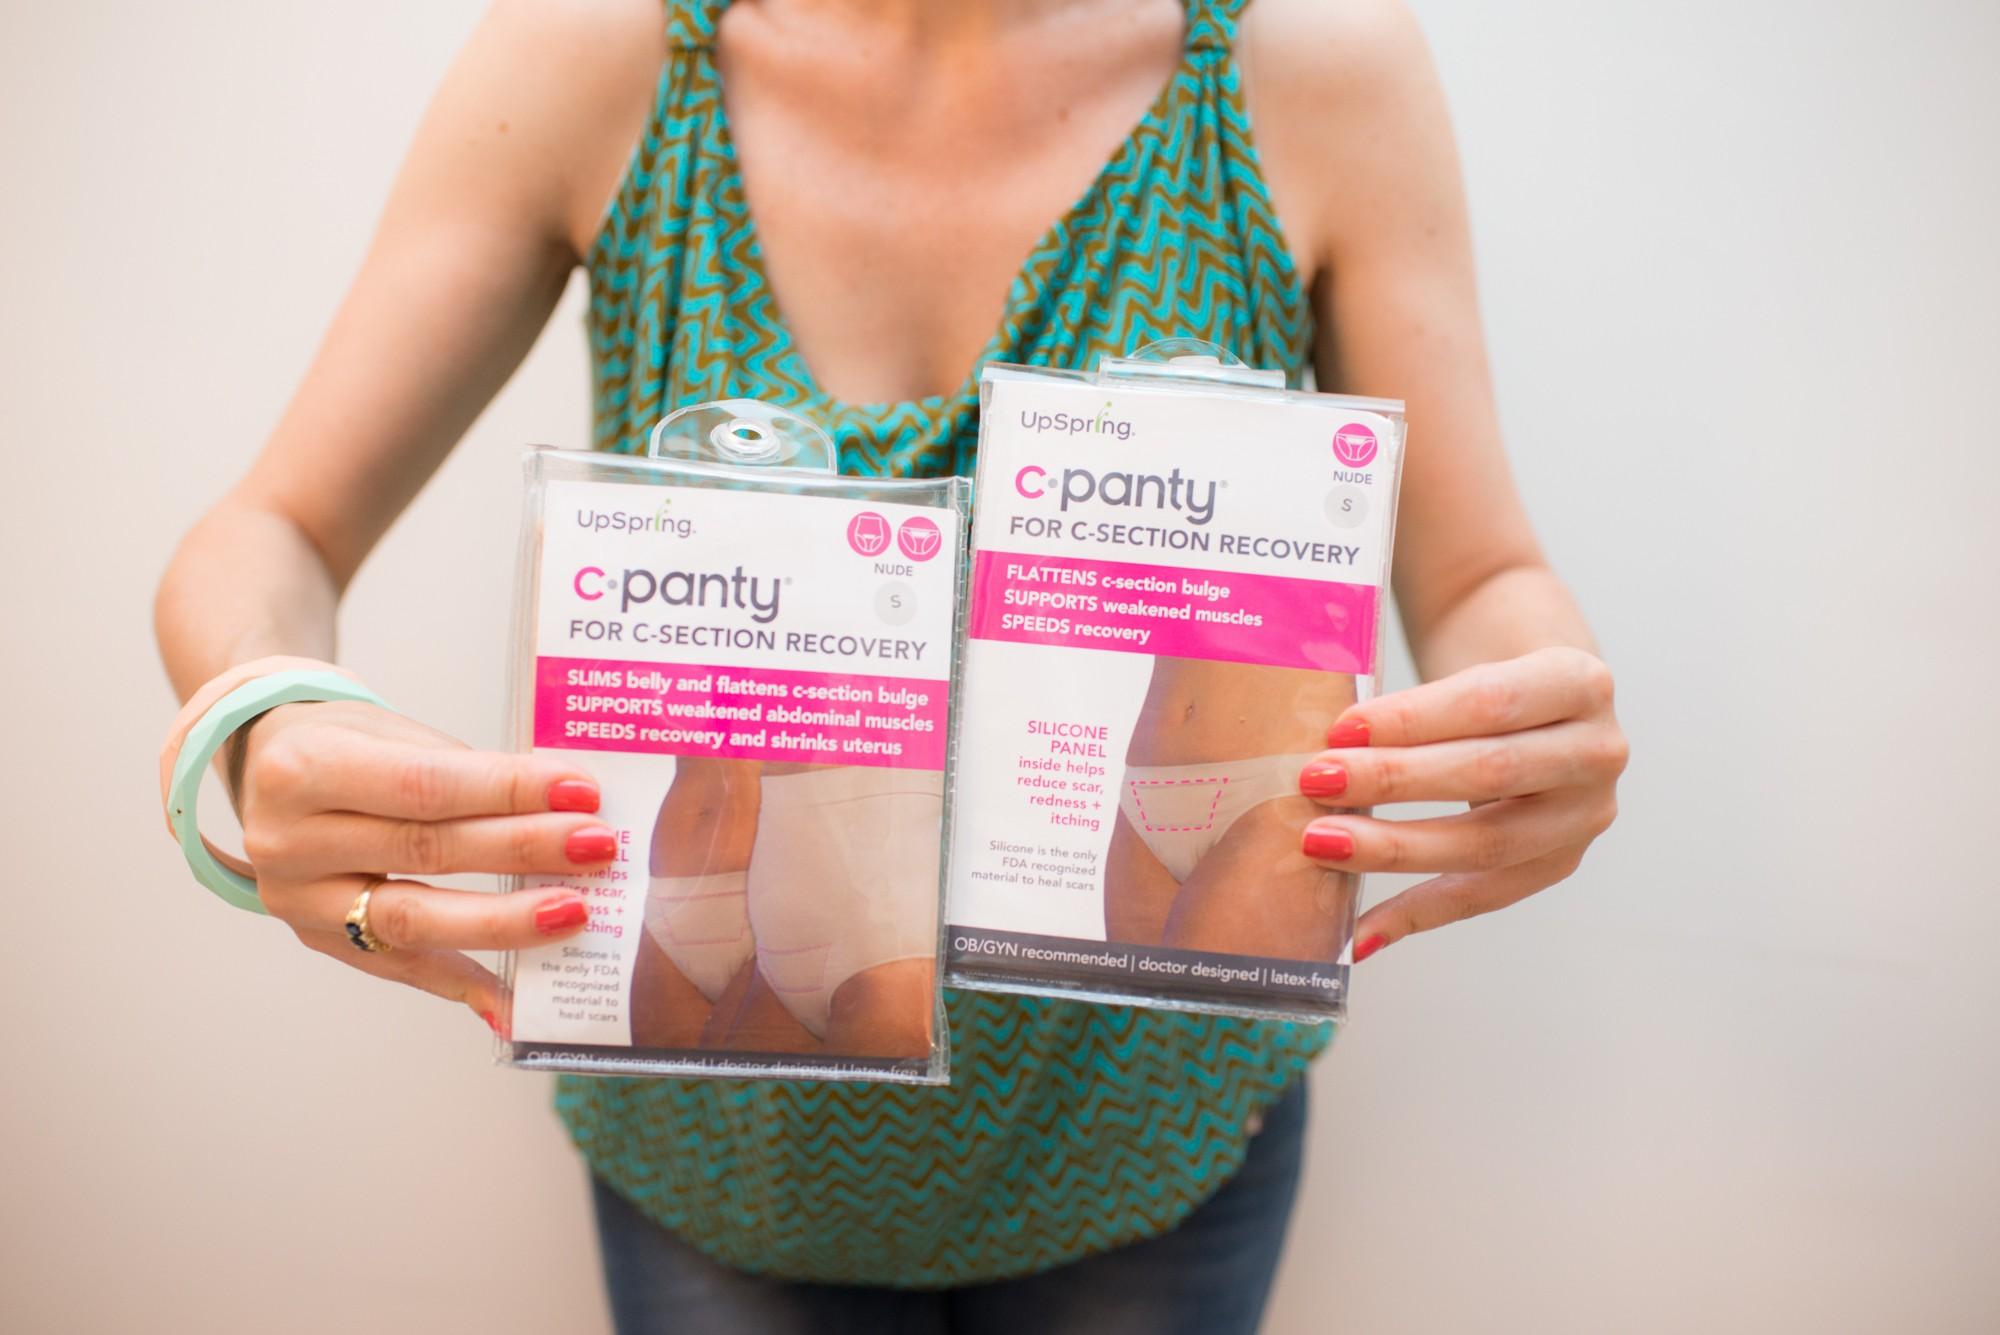 sous-vetements-post-cesarienne-c-panty-copyright-mumtobeparty